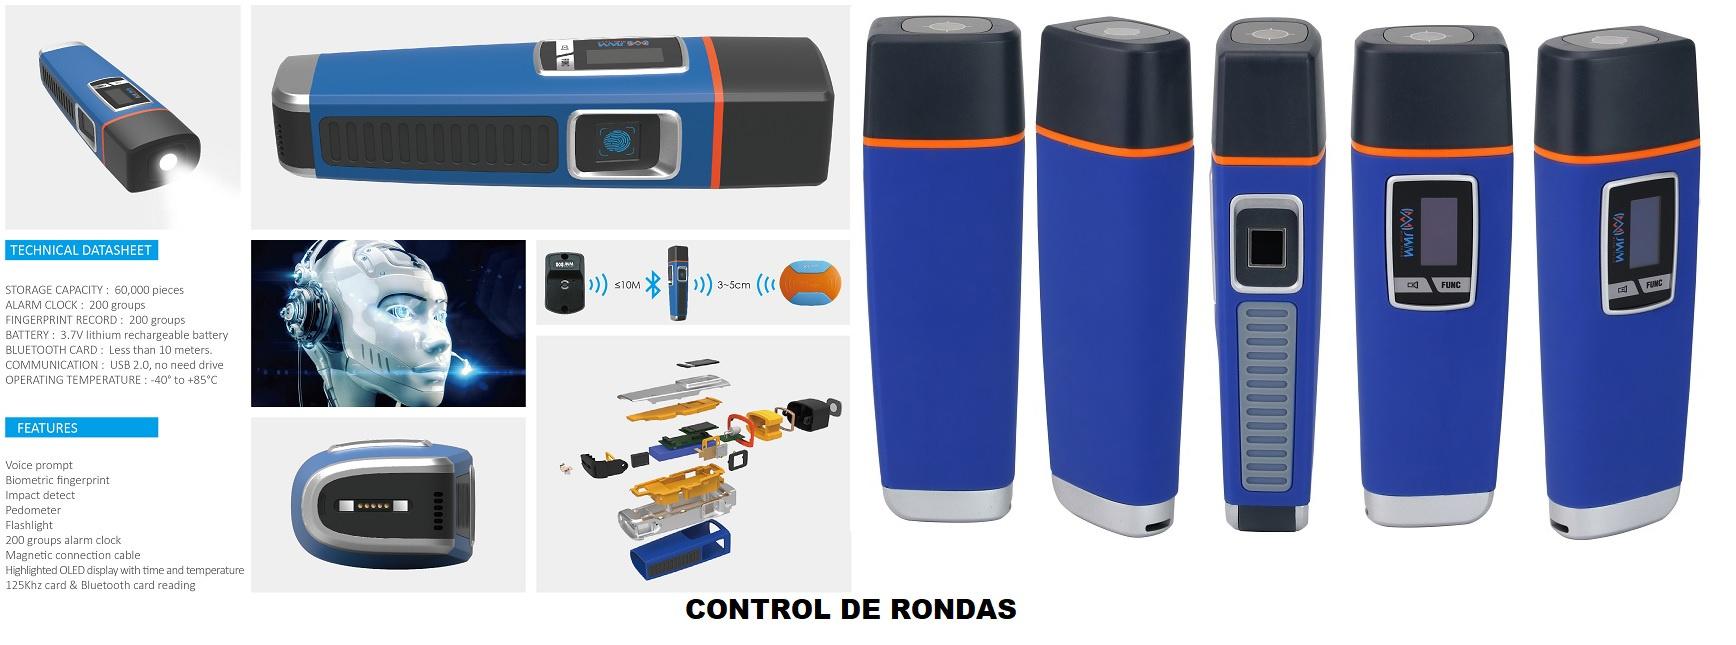 https://0201.nccdn.net/1_2/000/000/192/2e7/CONTROL-DE-RONDAS-1736x645.jpg